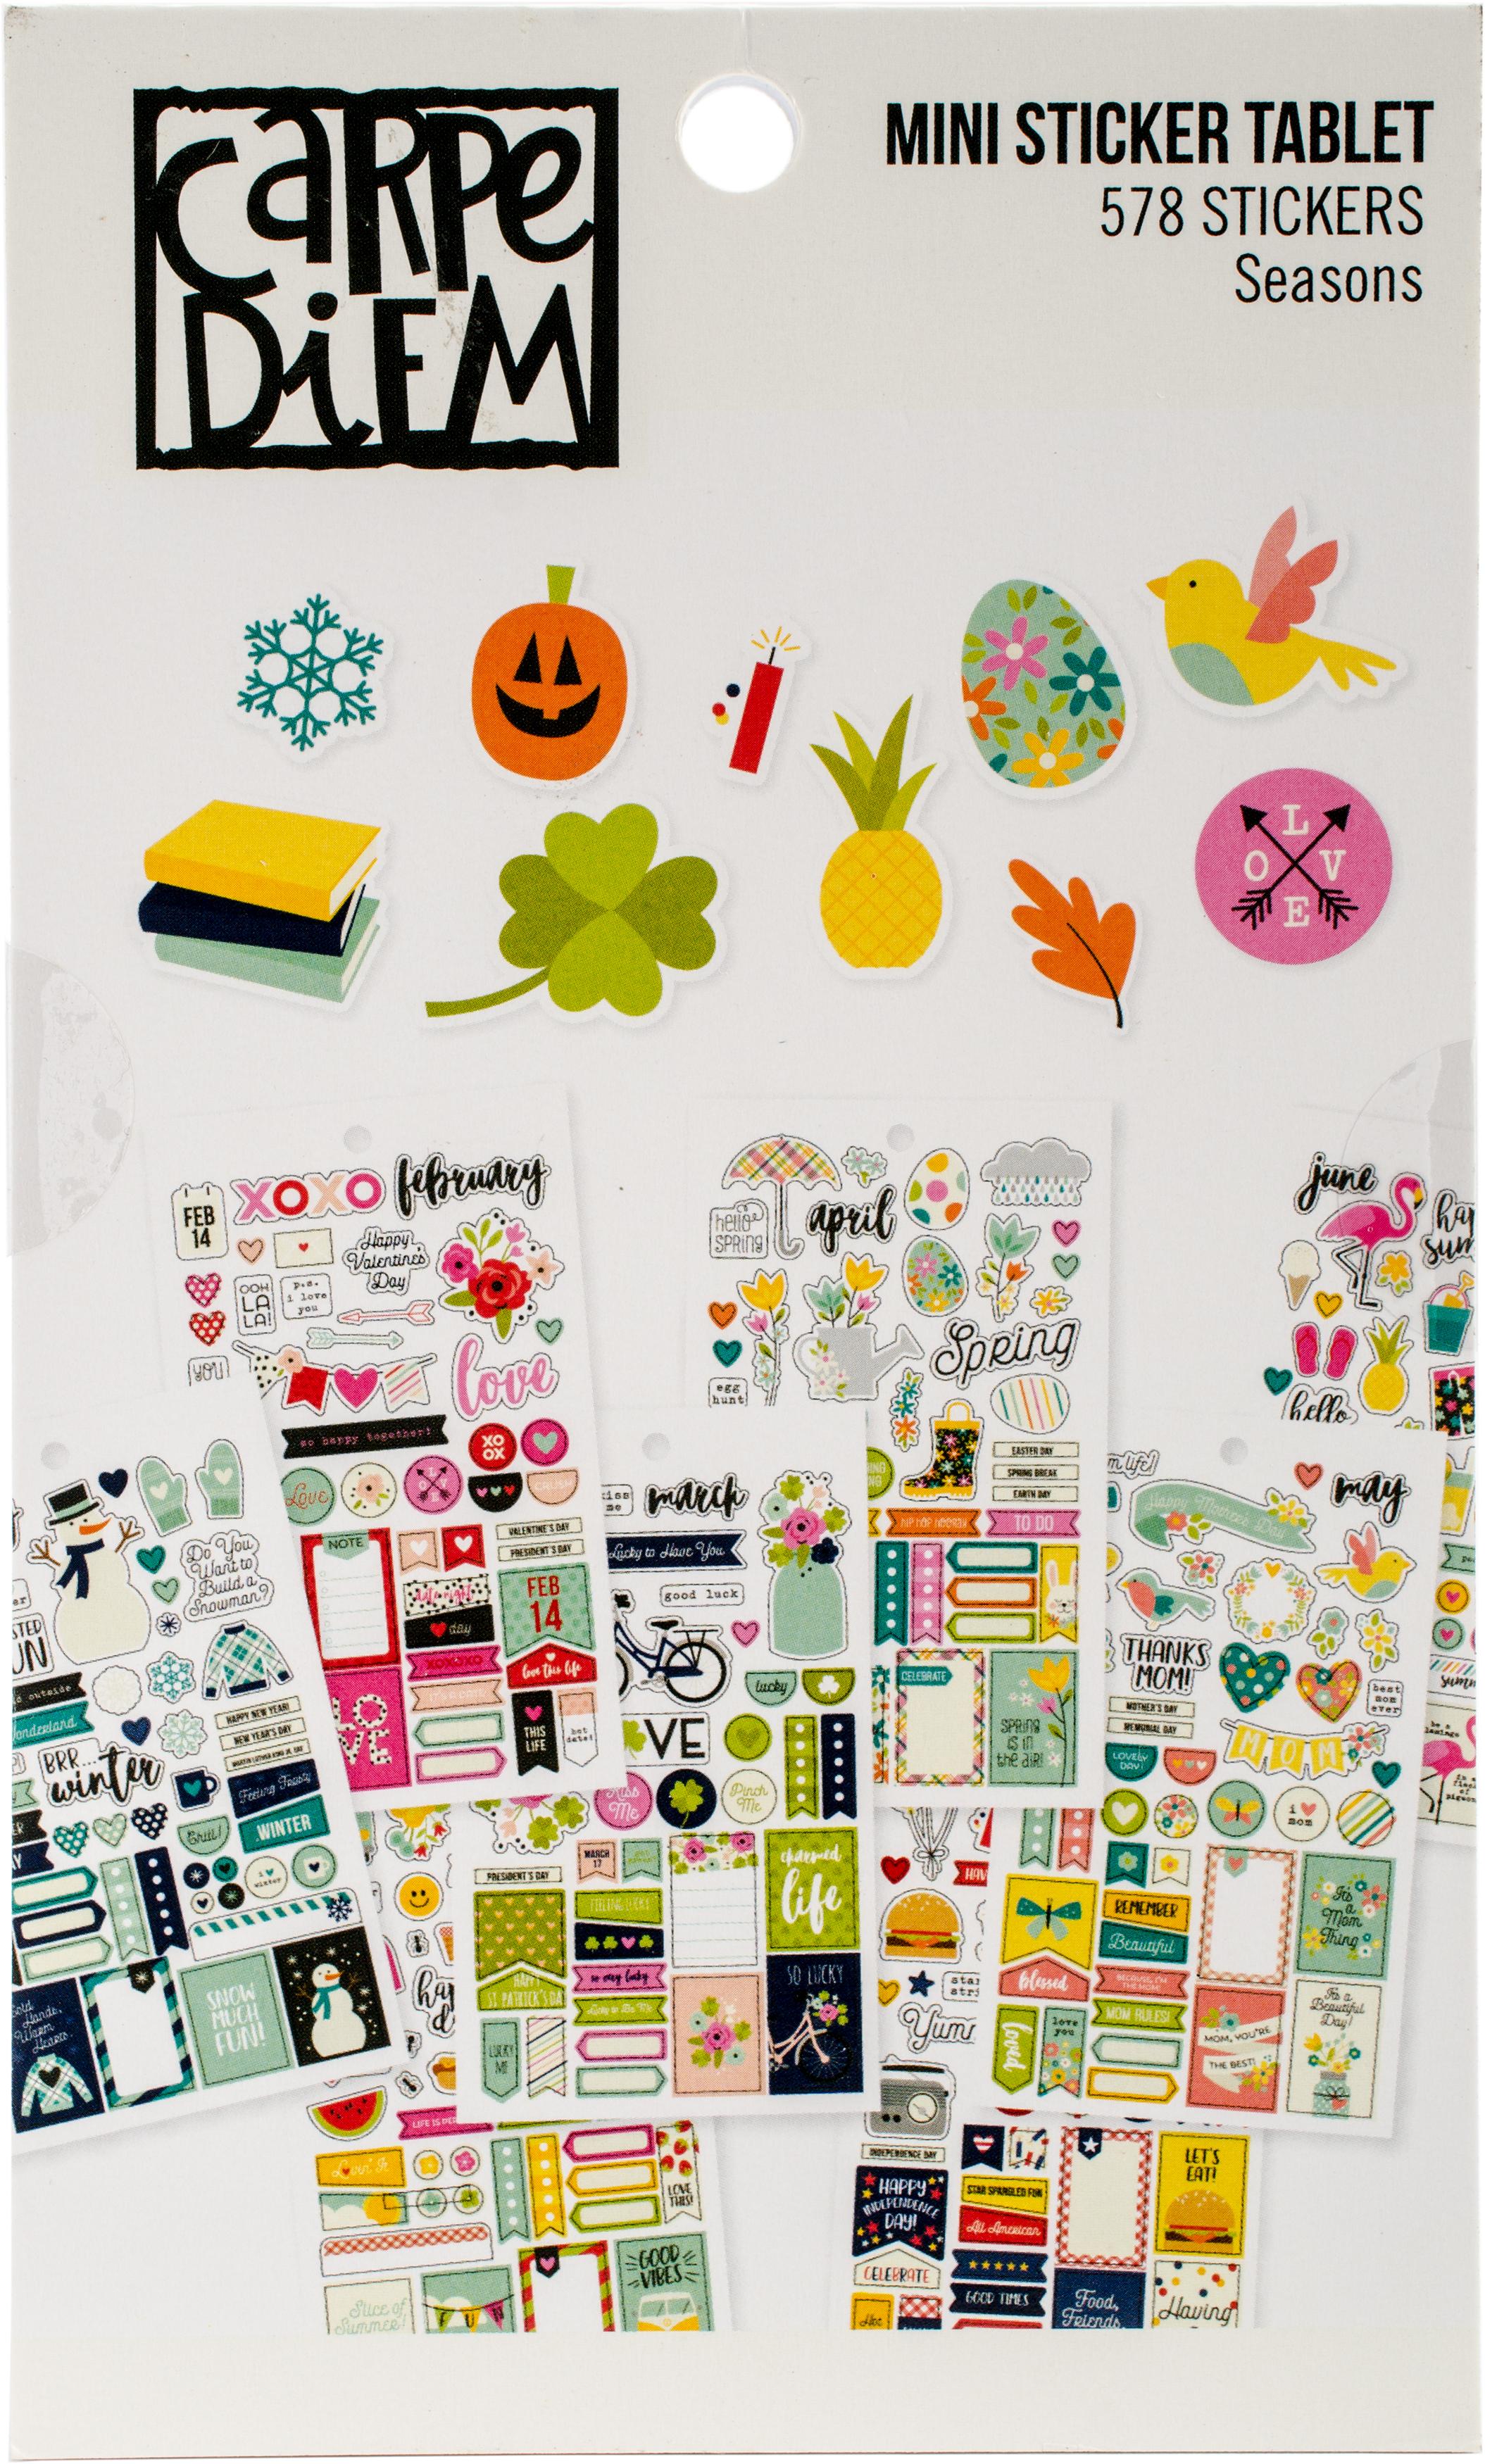 Seasons Mini Sticker Tablet